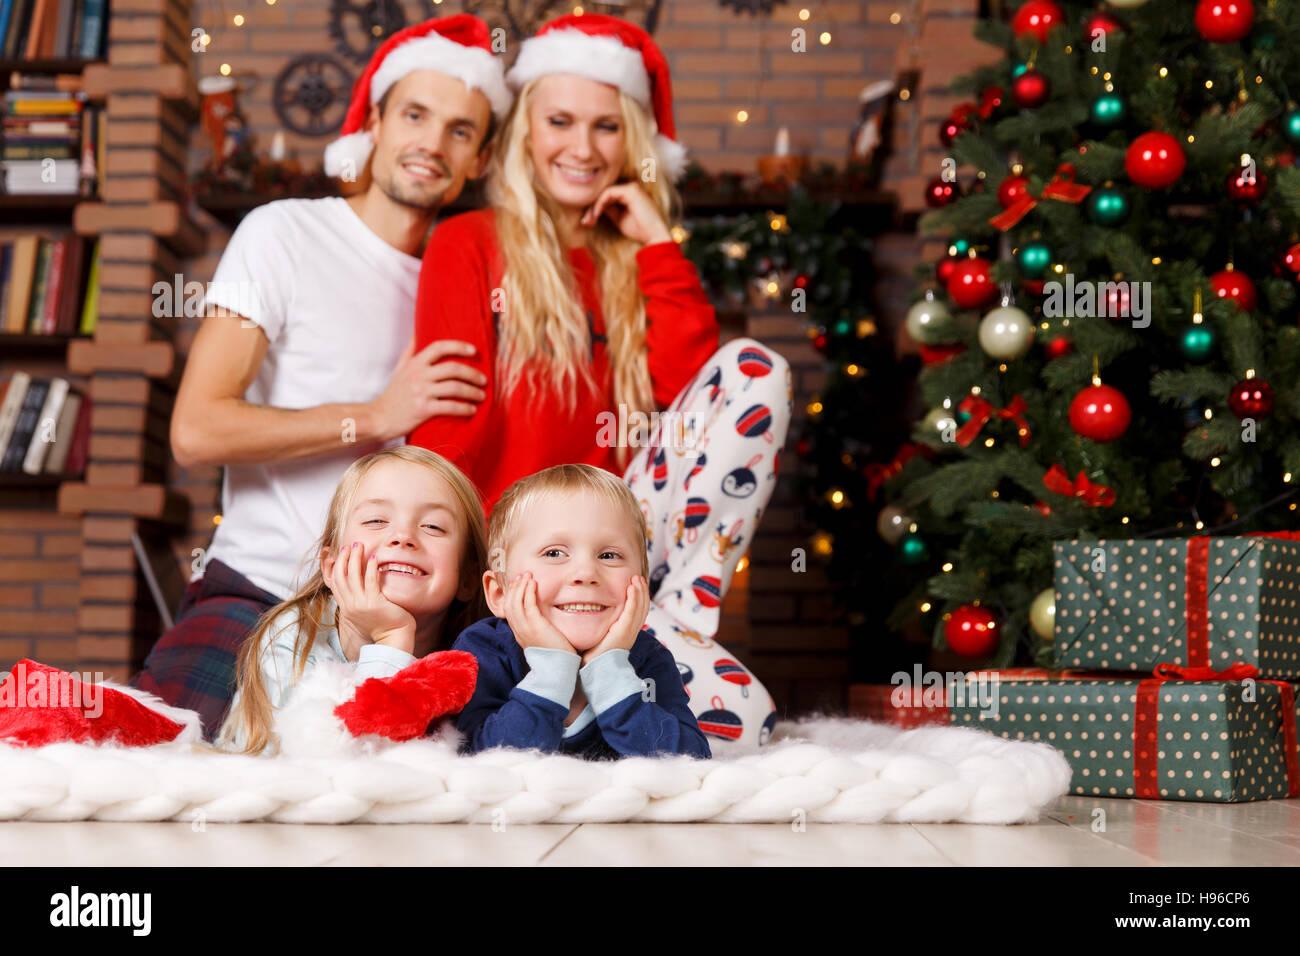 Family in sleepwear on Christmas - Stock Image